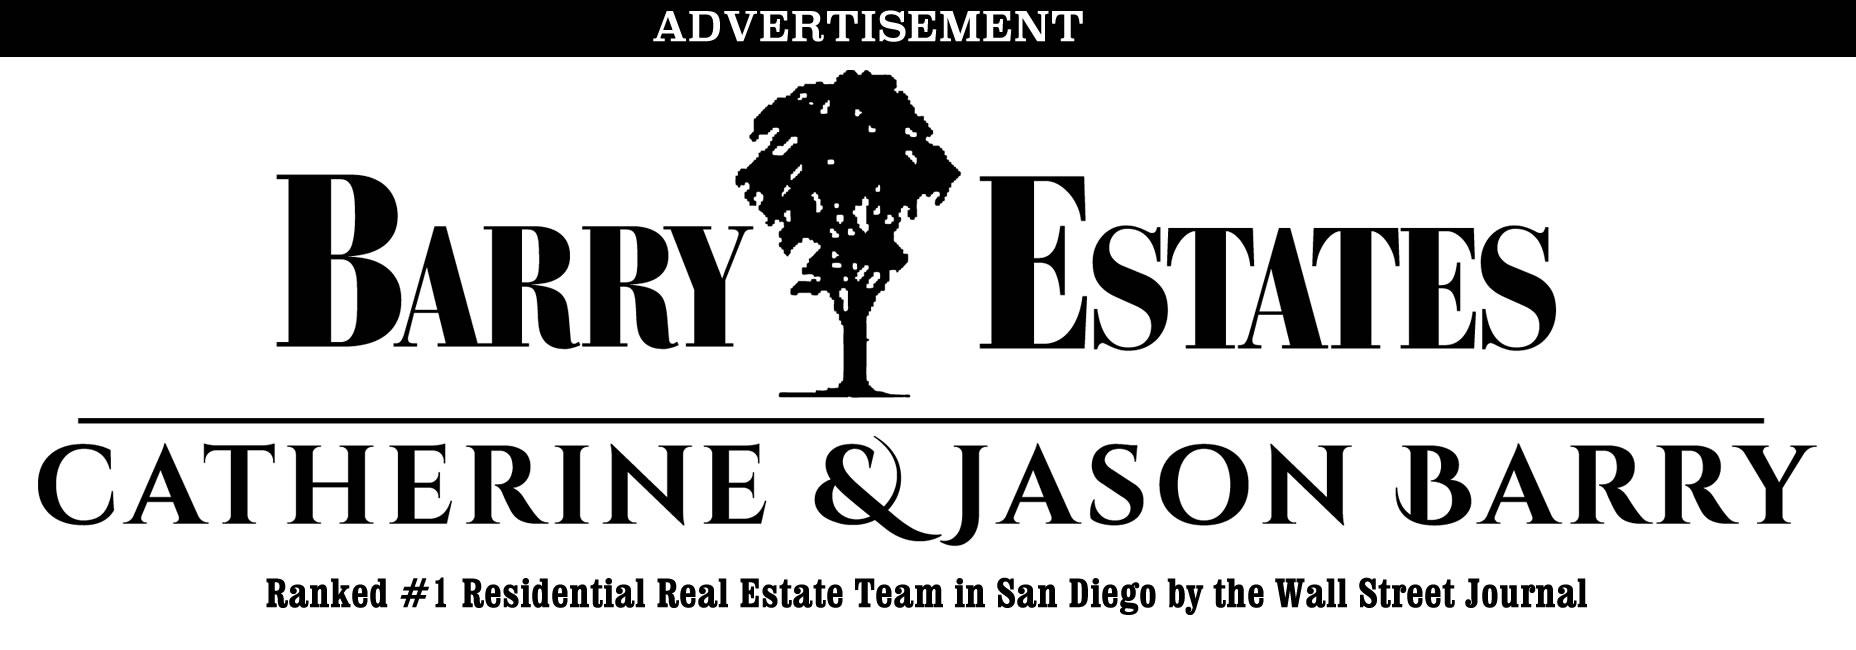 barry-estates-ad-3-1.jpg